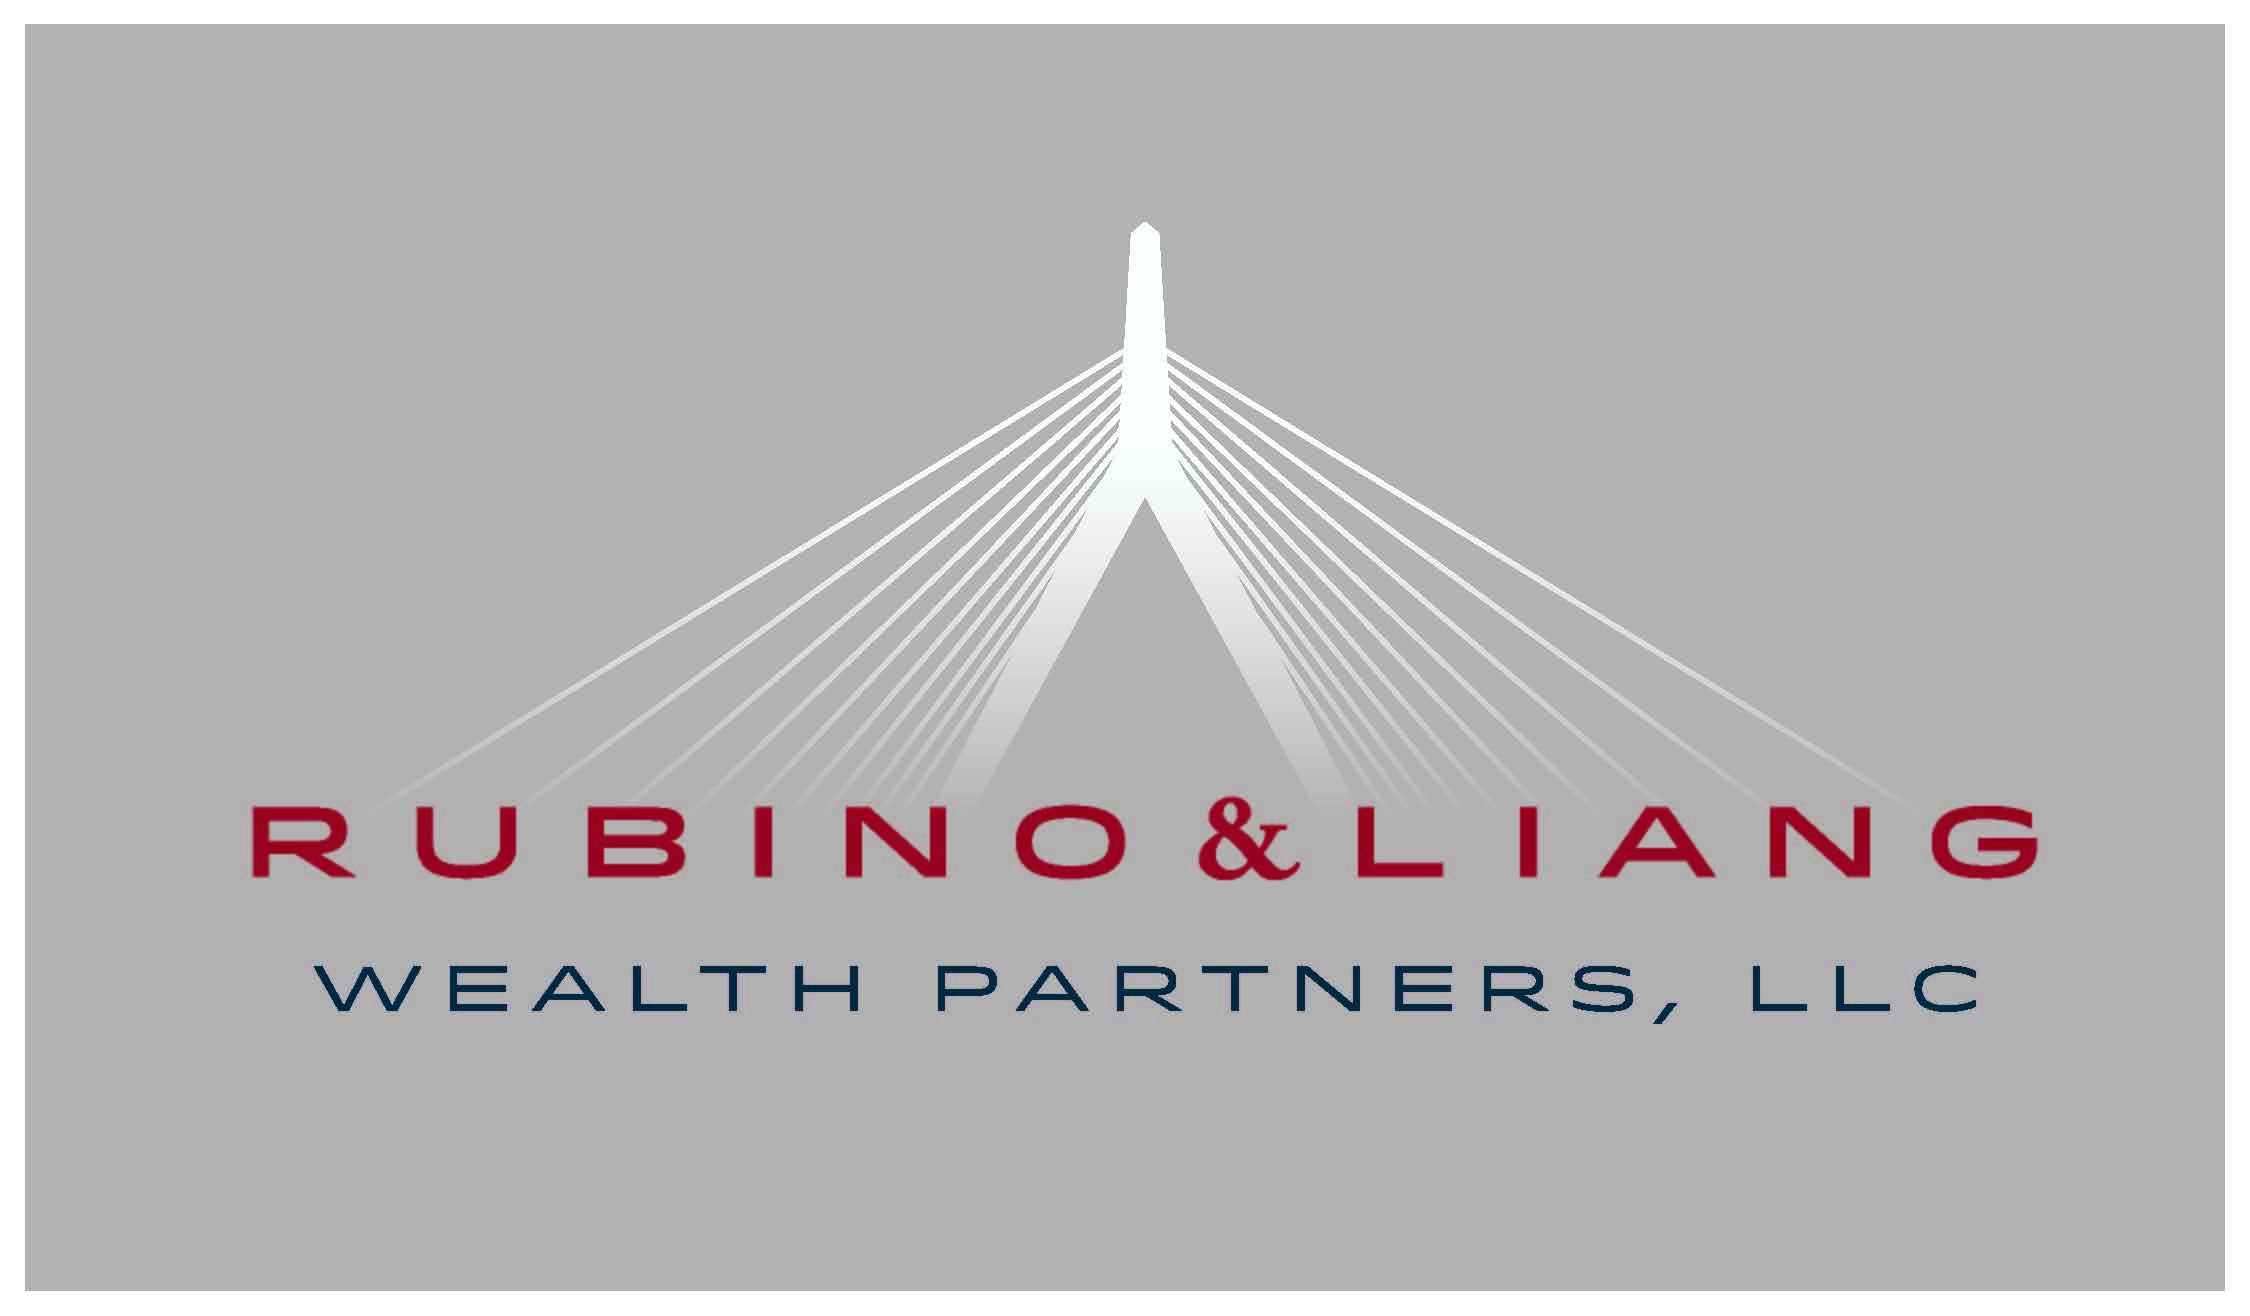 Rubino & Liang Wealth Partners